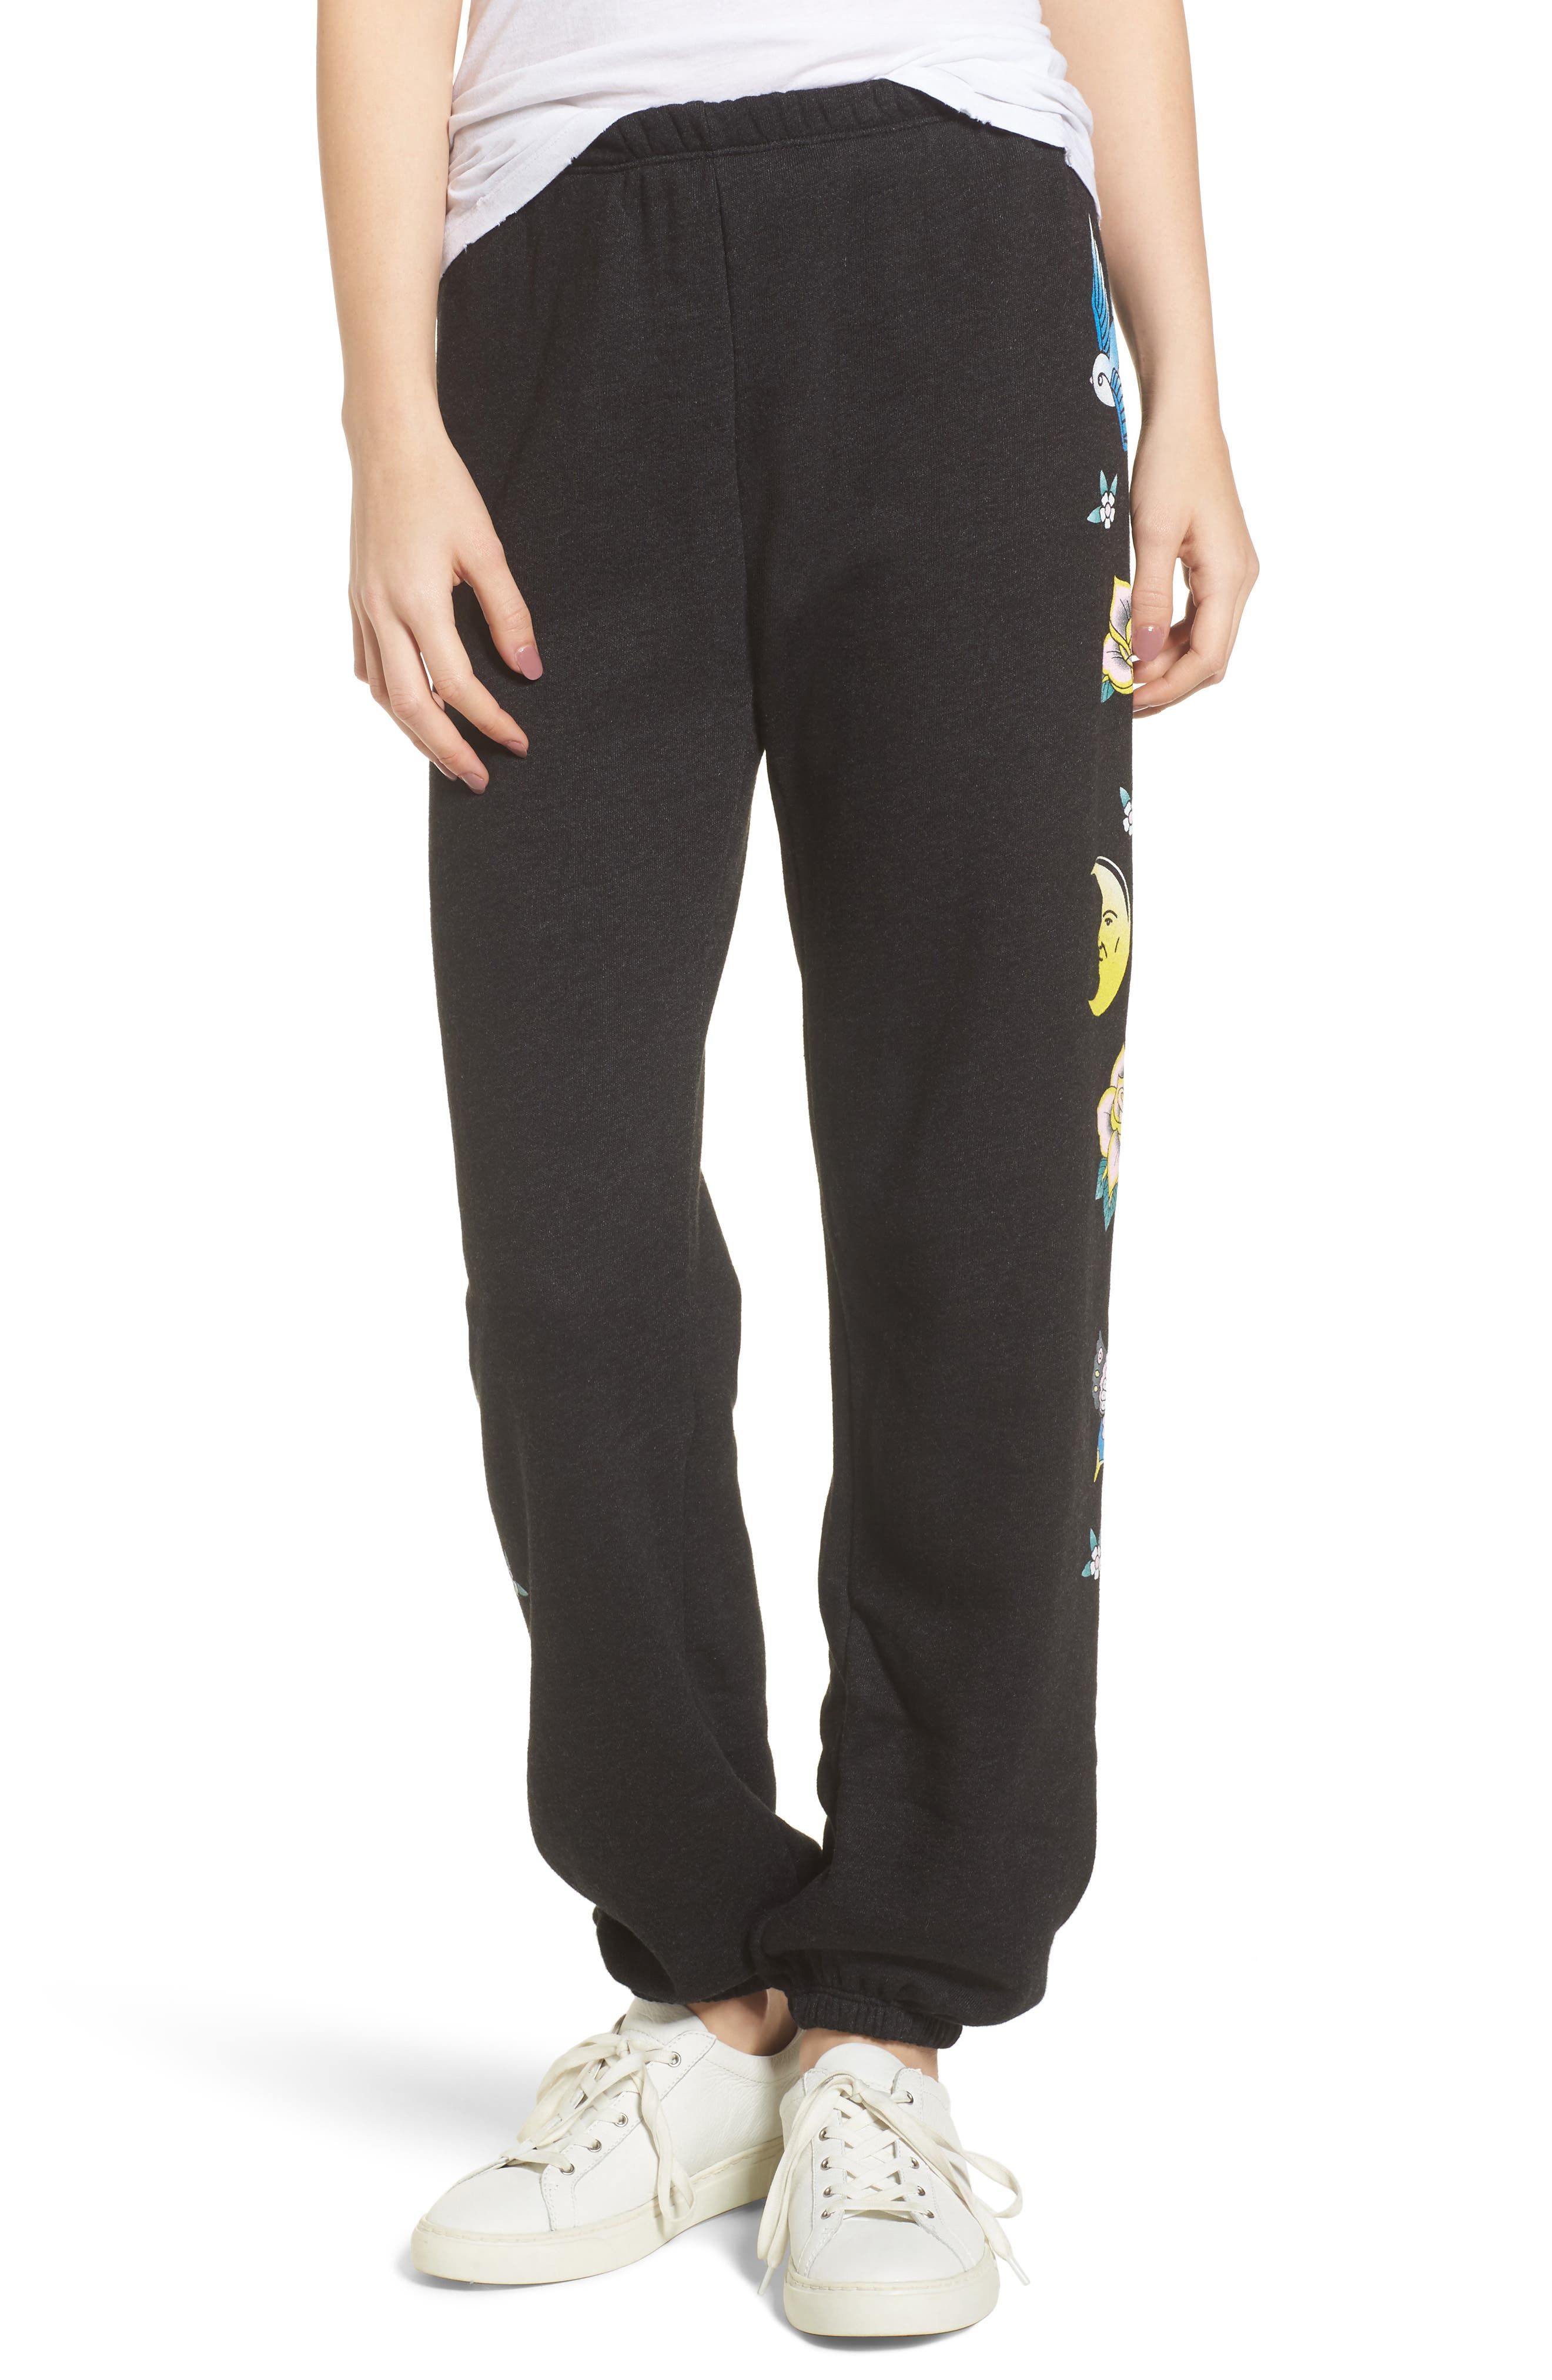 Wildfox Flash Sweatpants